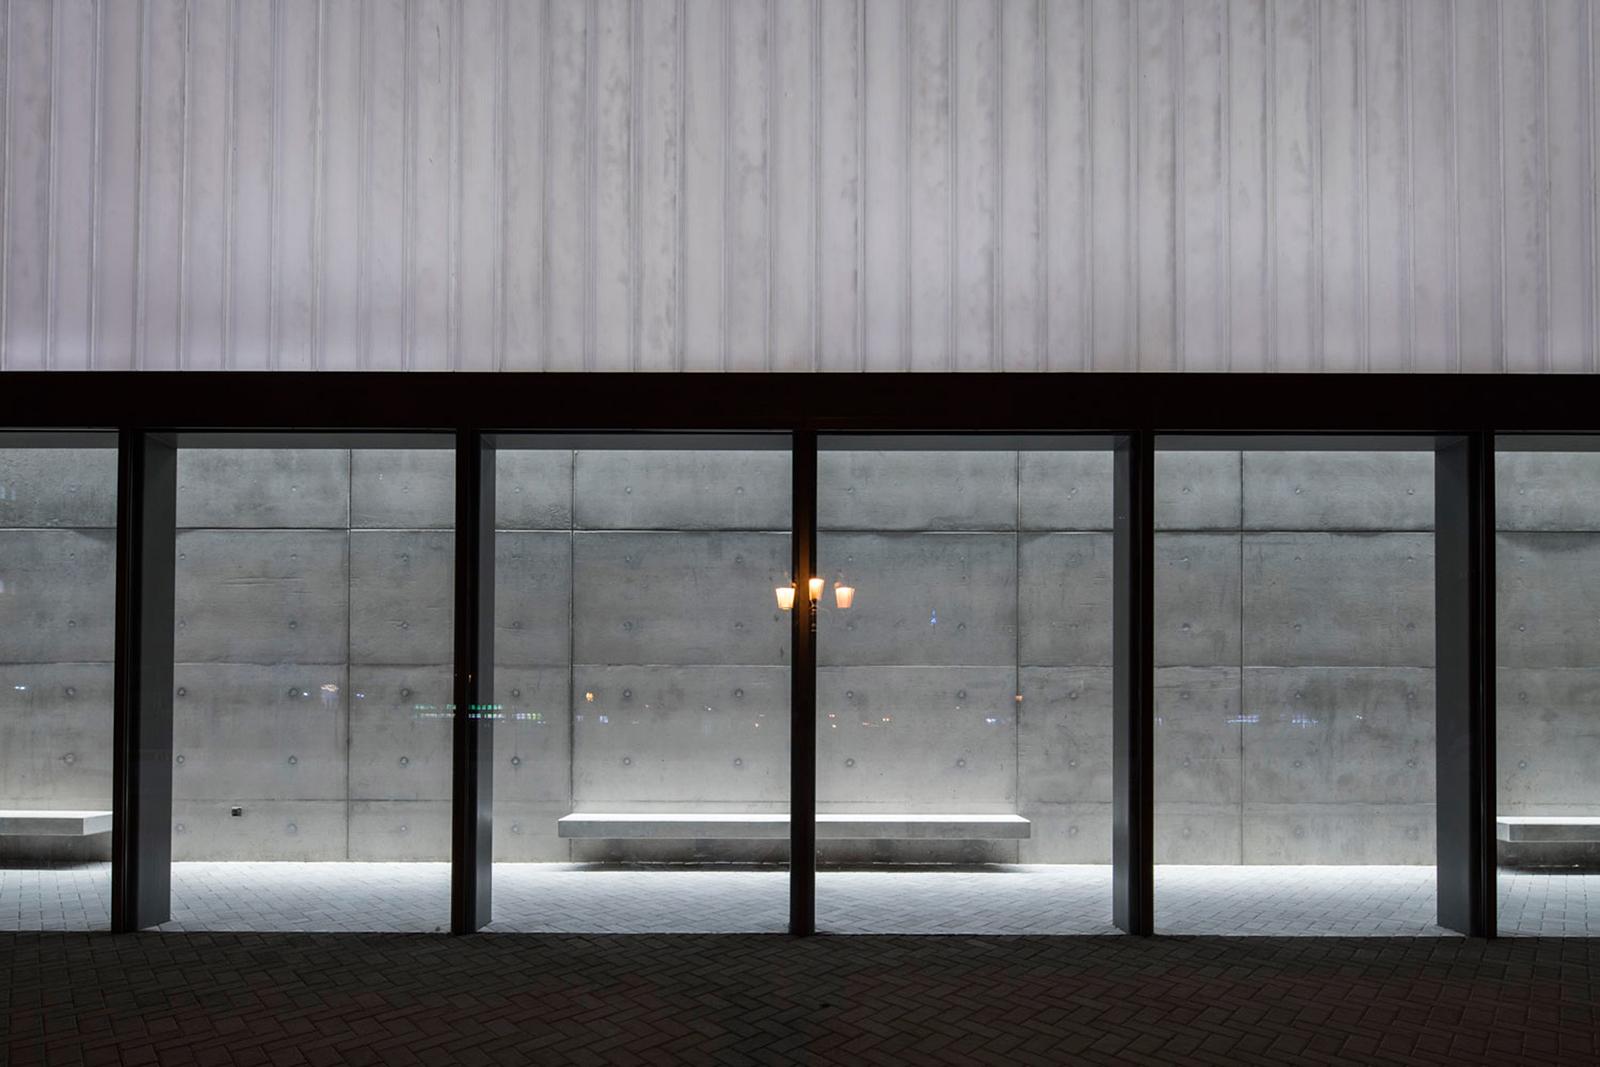 Rain Room - on display in Dubai in a custom-built space in the city's art quarter